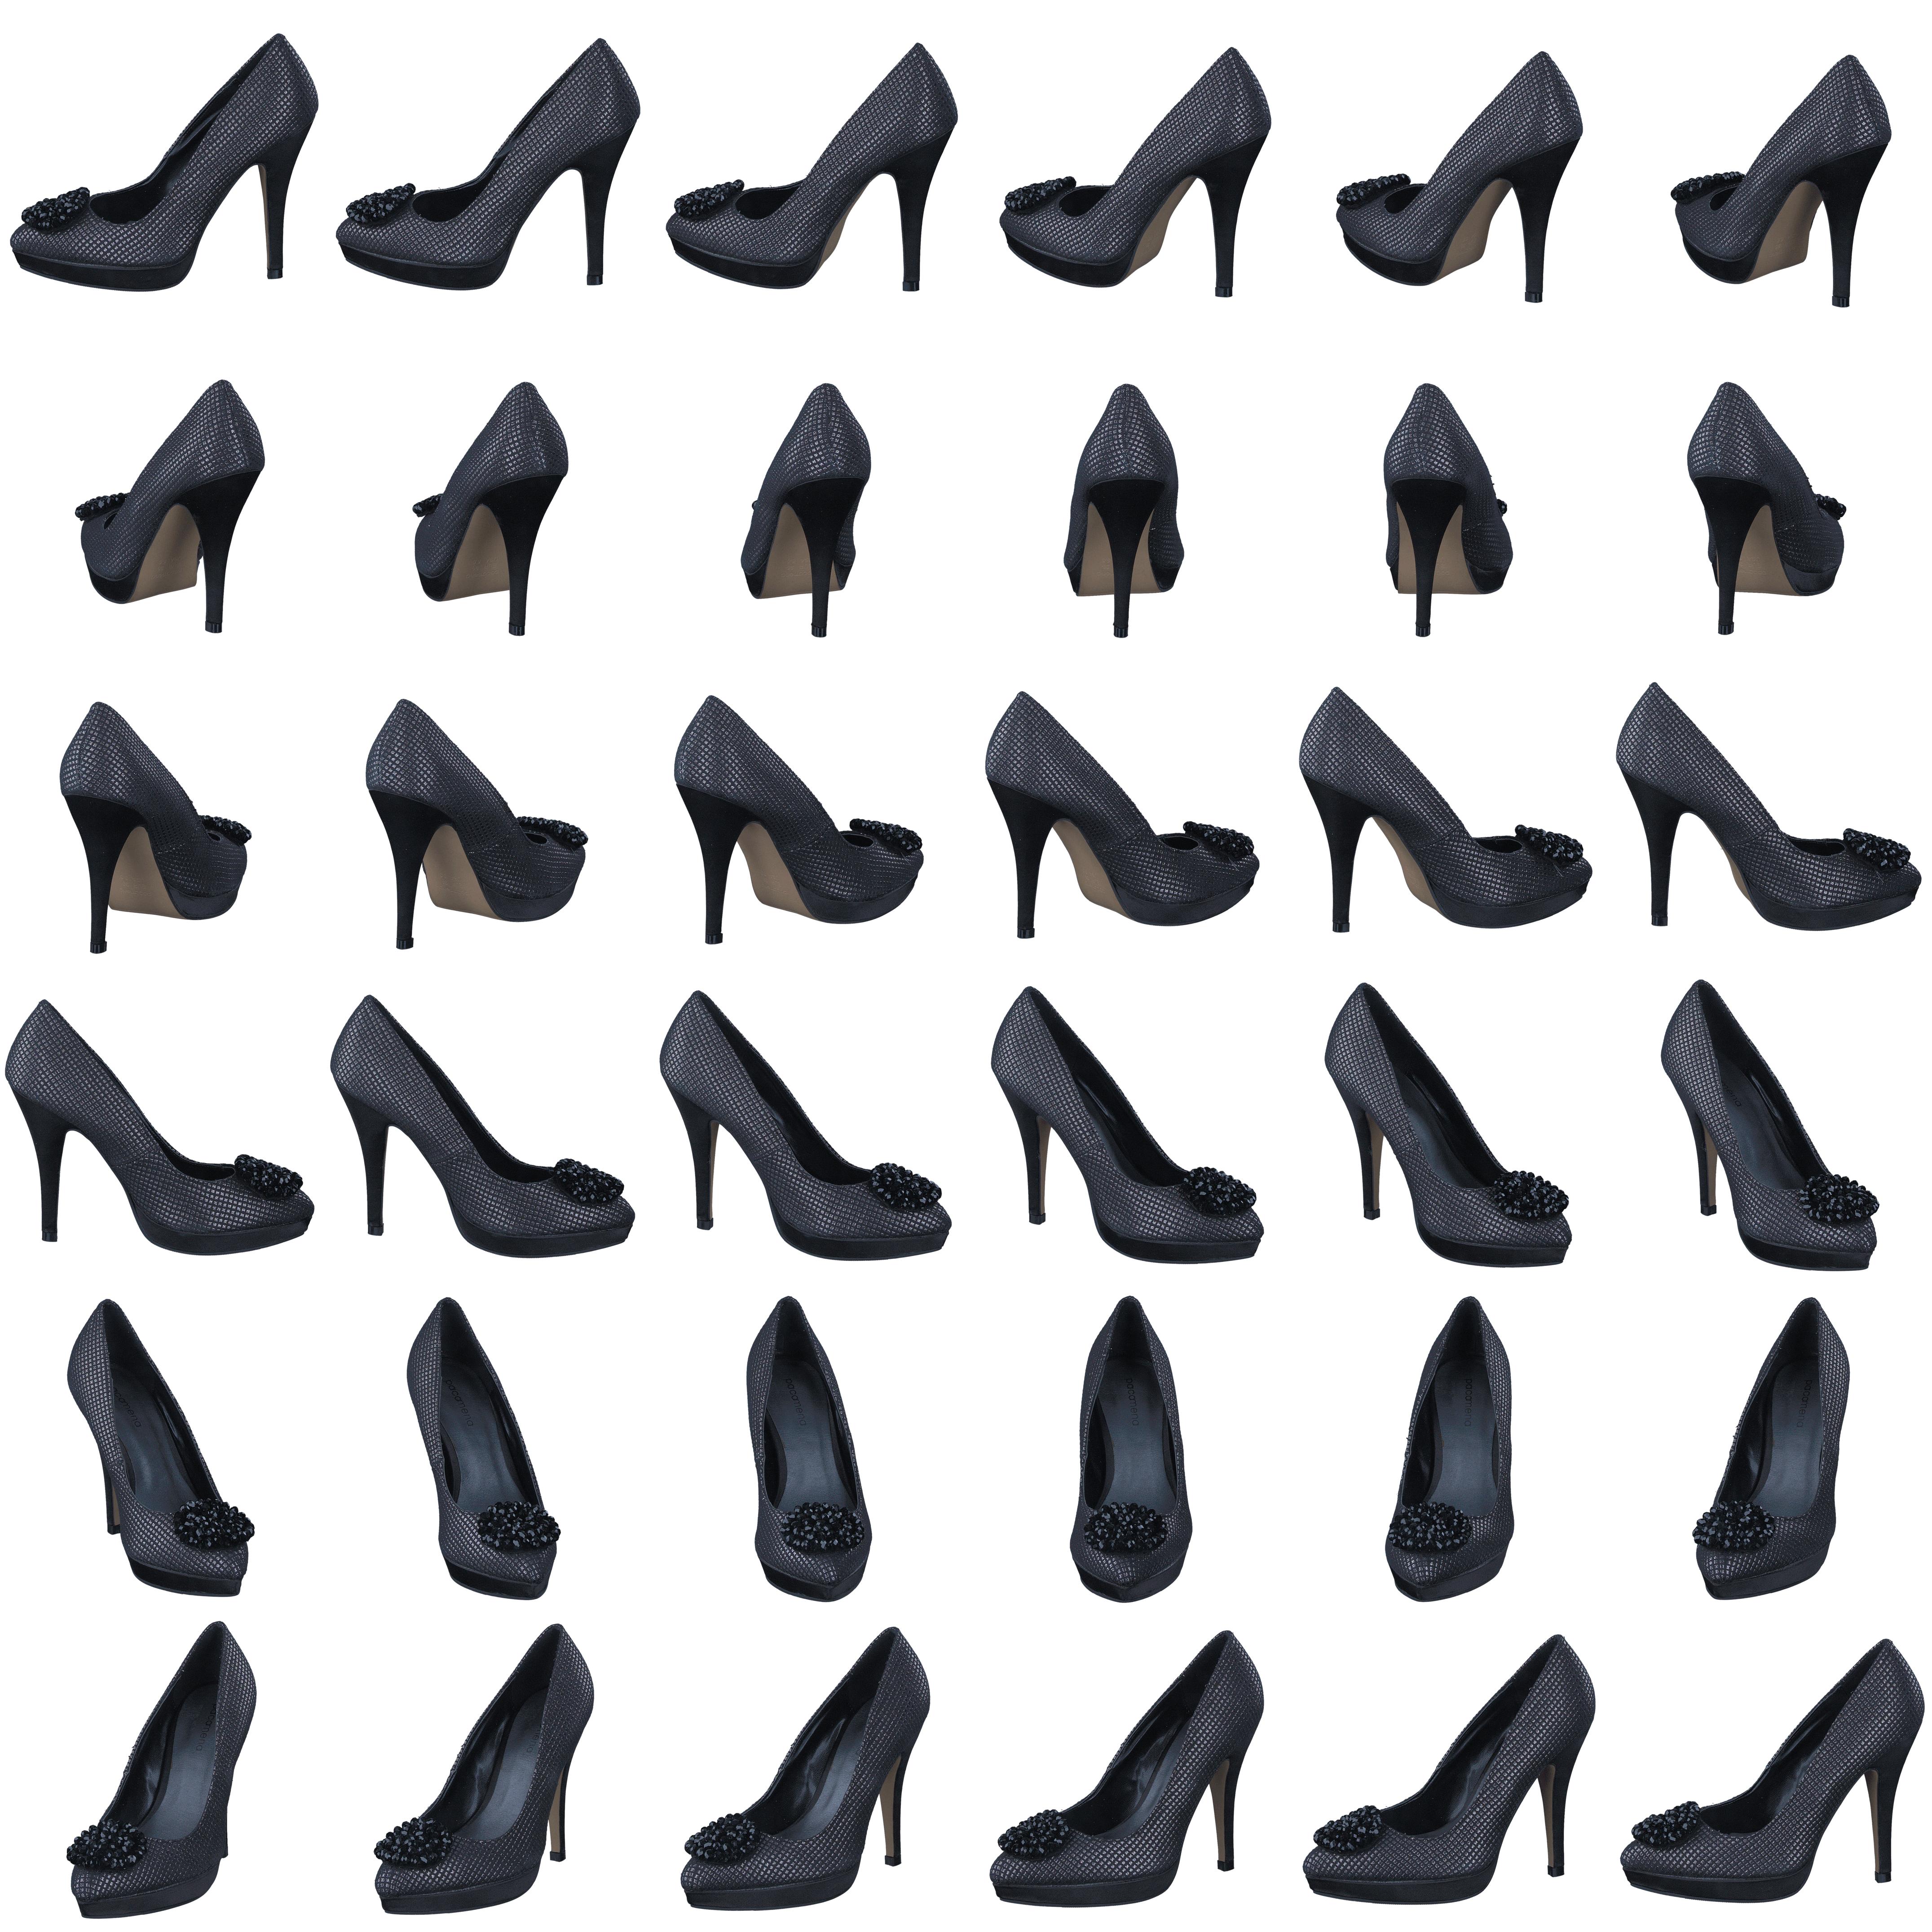 1to3 V13083, Schuhe, Absatzschuhe, Absatzschuhe, Blau, Grau, Female, 36